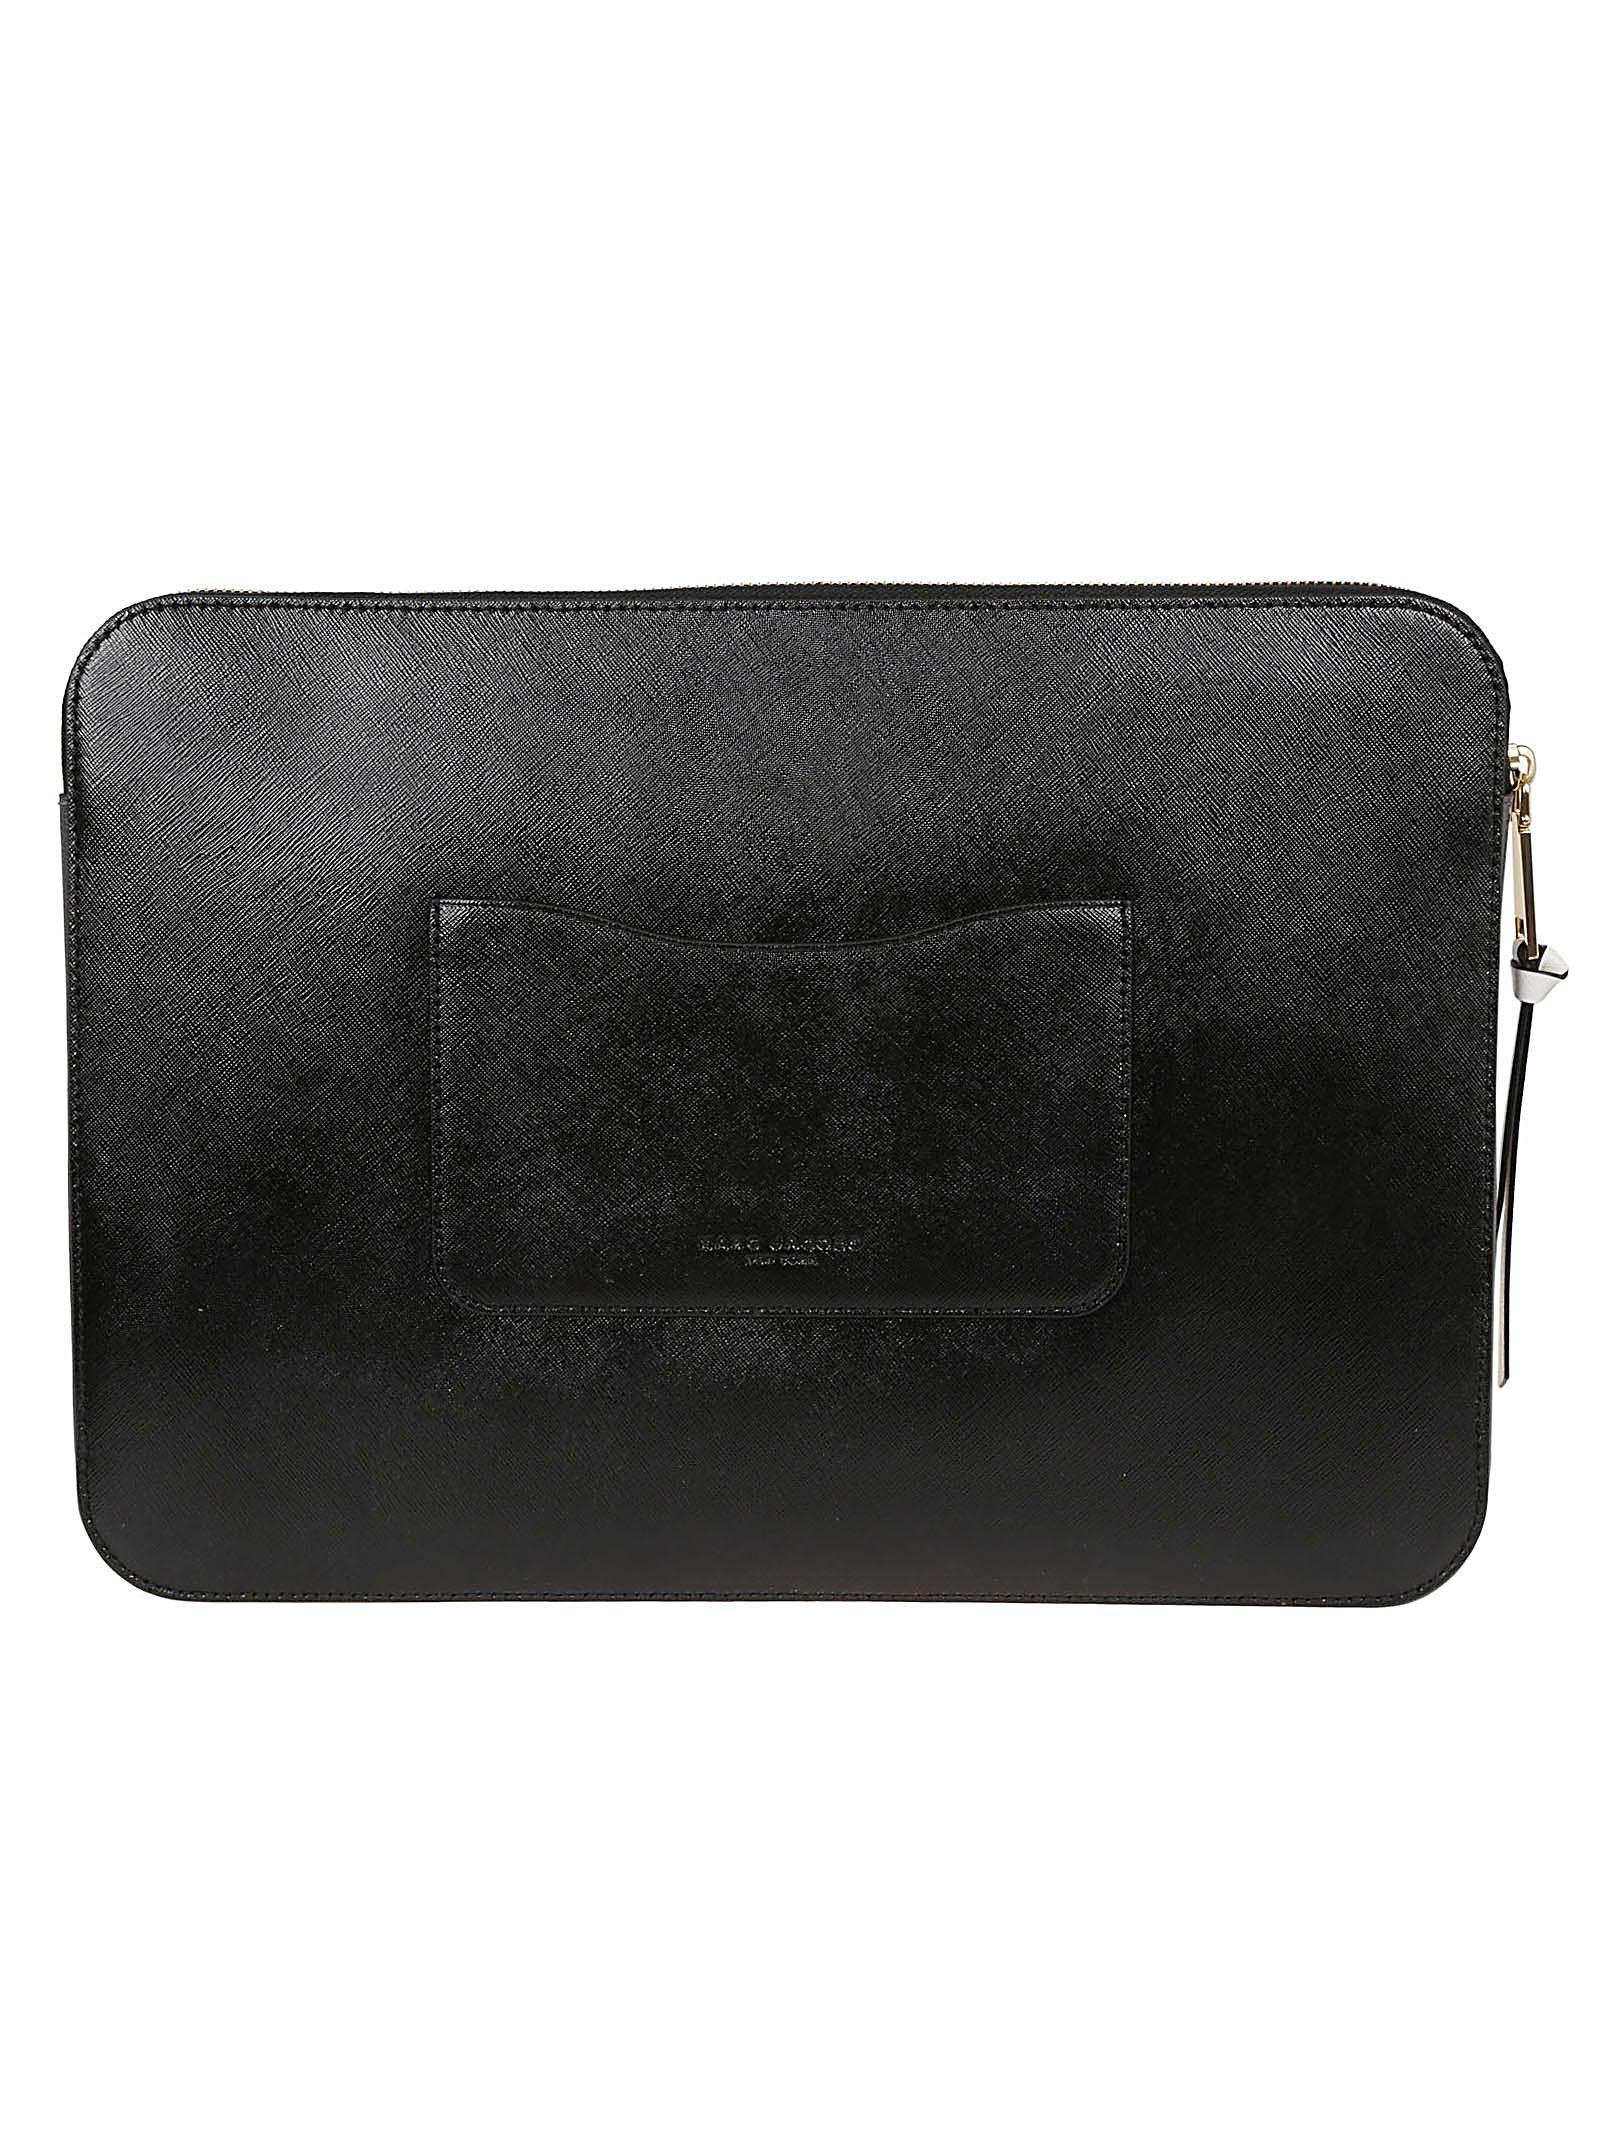 Marc Jacobs Snapshot 15 Laptop Case